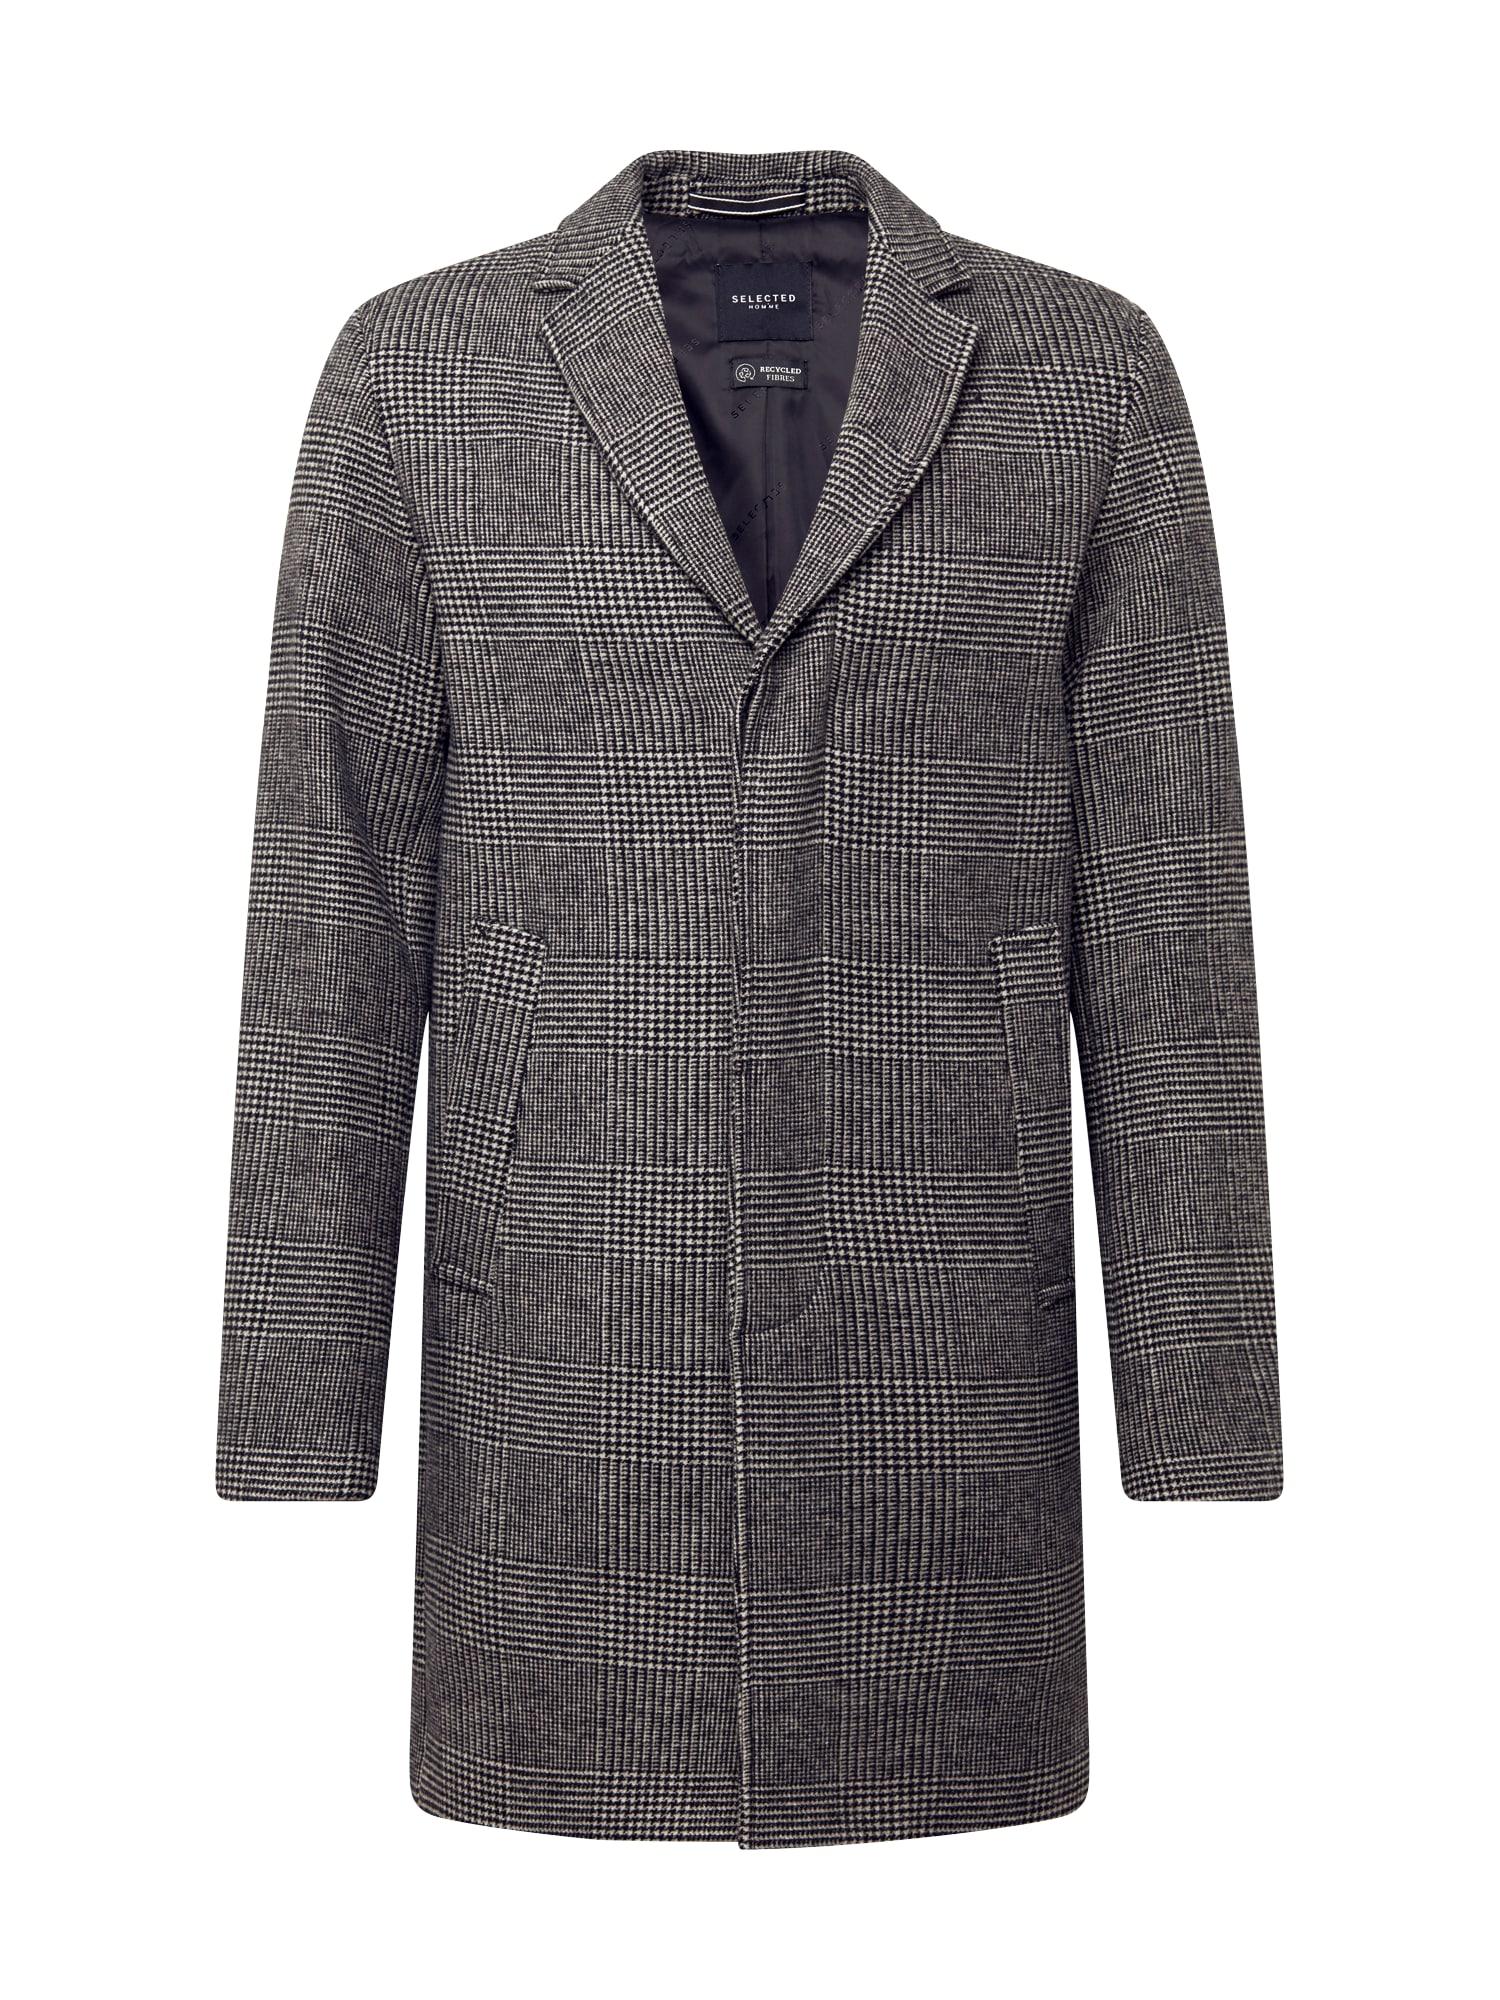 SELECTED HOMME Rudeninis-žieminis paltas 'HAGEN' pilka / antracito